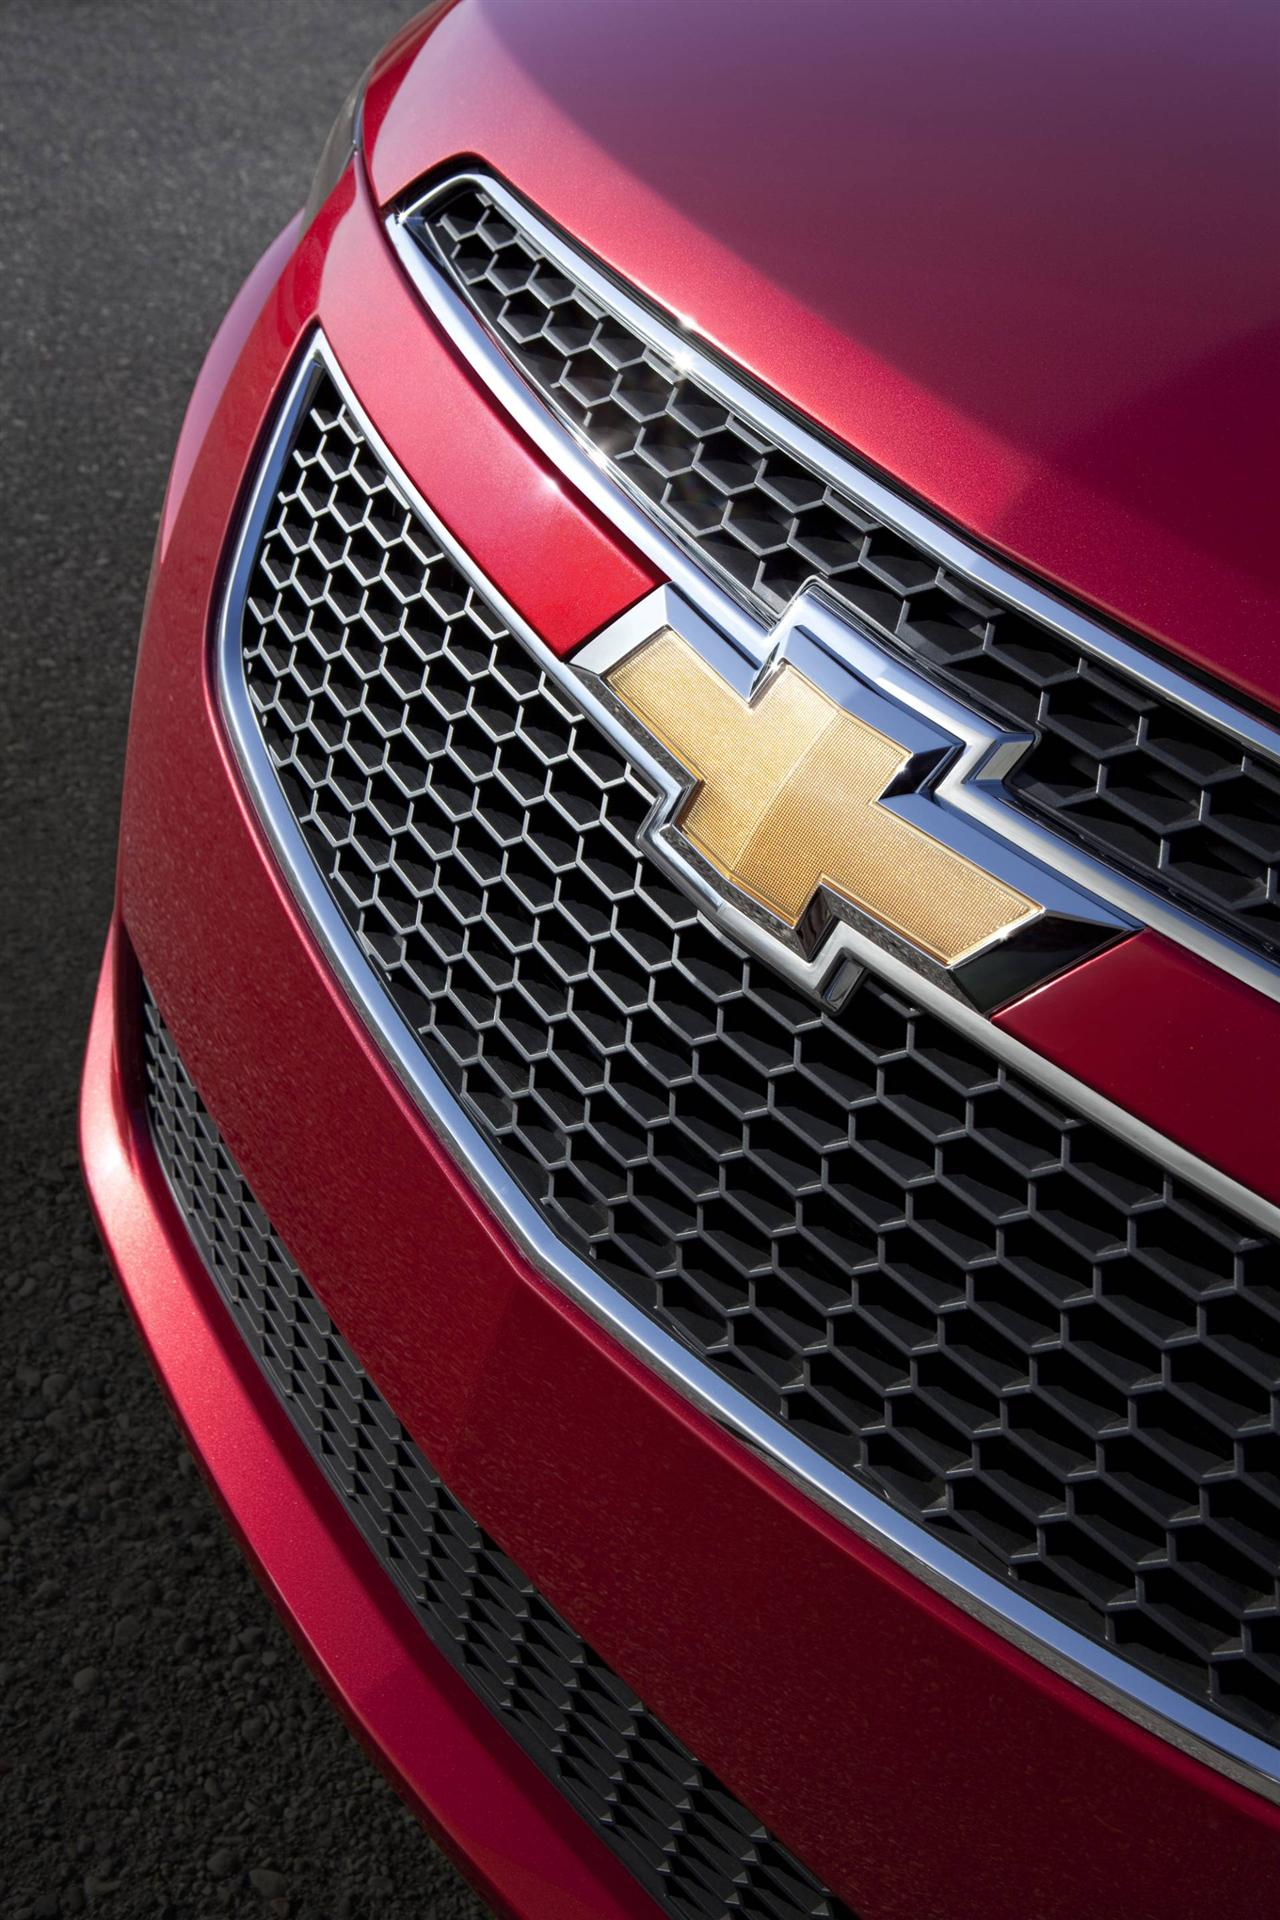 Chevrolet Cruze Infotainment System: Radio Data System (RDS)